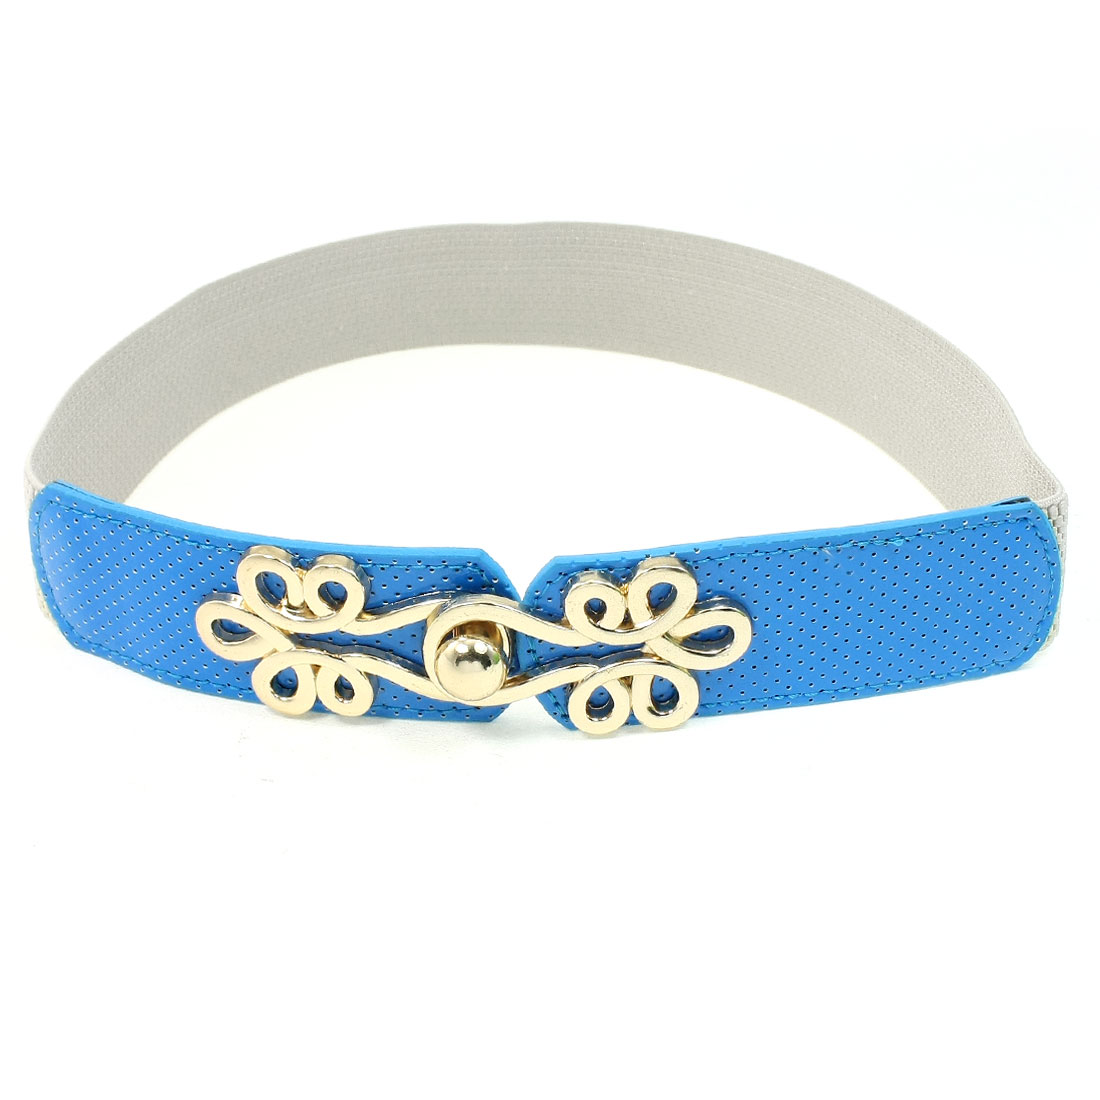 Gold Tone Interlocking Buckle Blue Faux Leather Elastic Waistbelt for Women